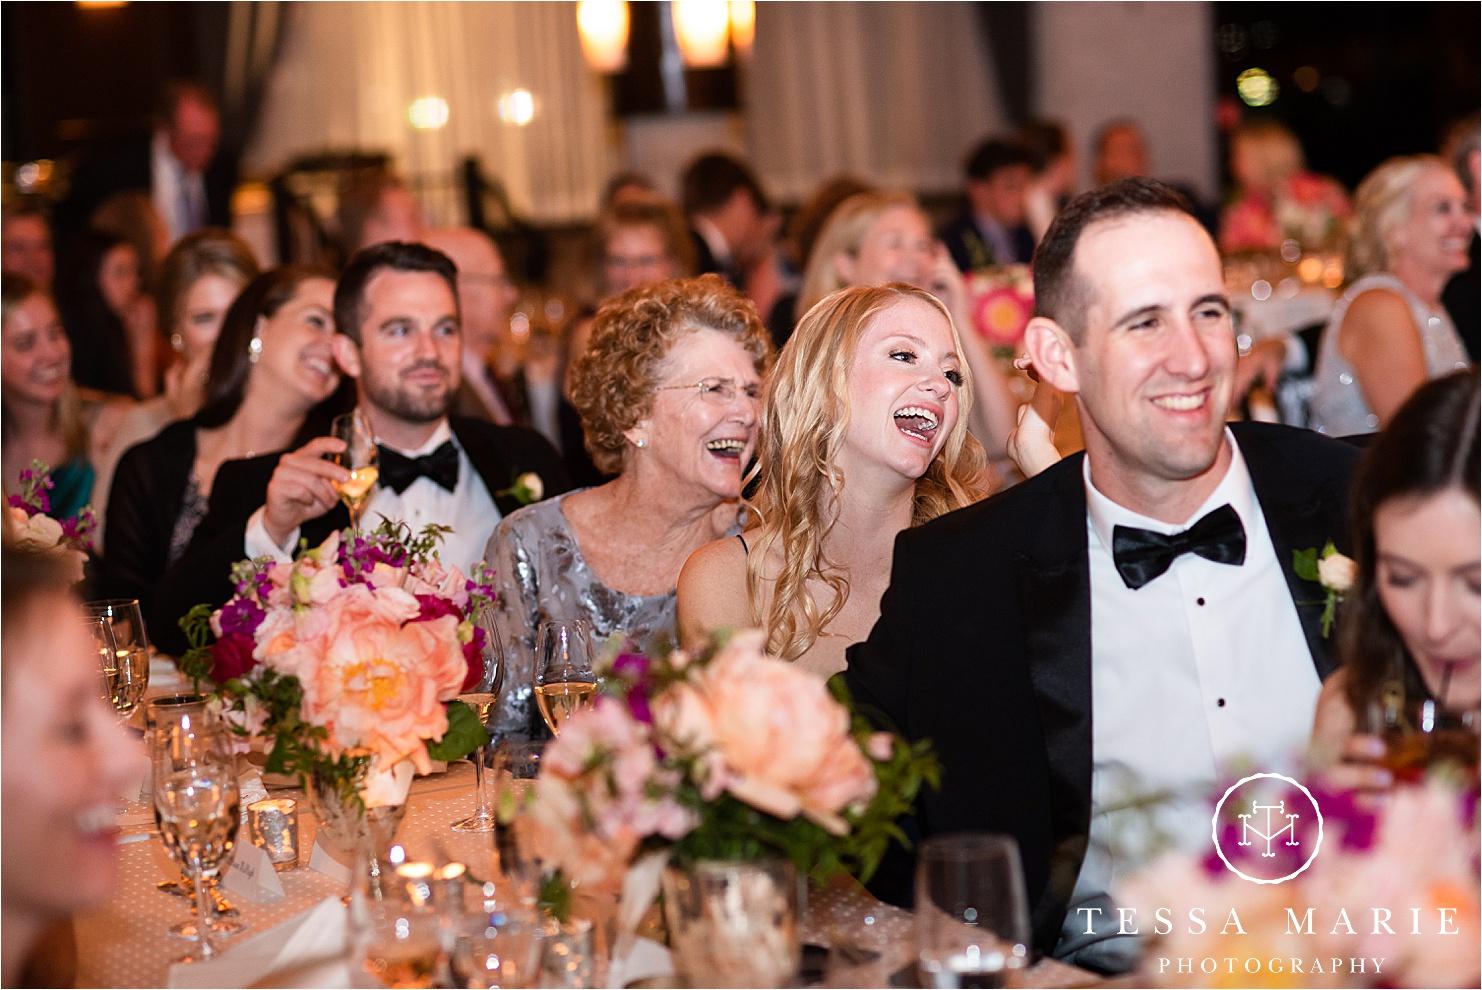 Tessa_marie_weddings_houston_wedding_photographer_The_astorian_0164.jpg